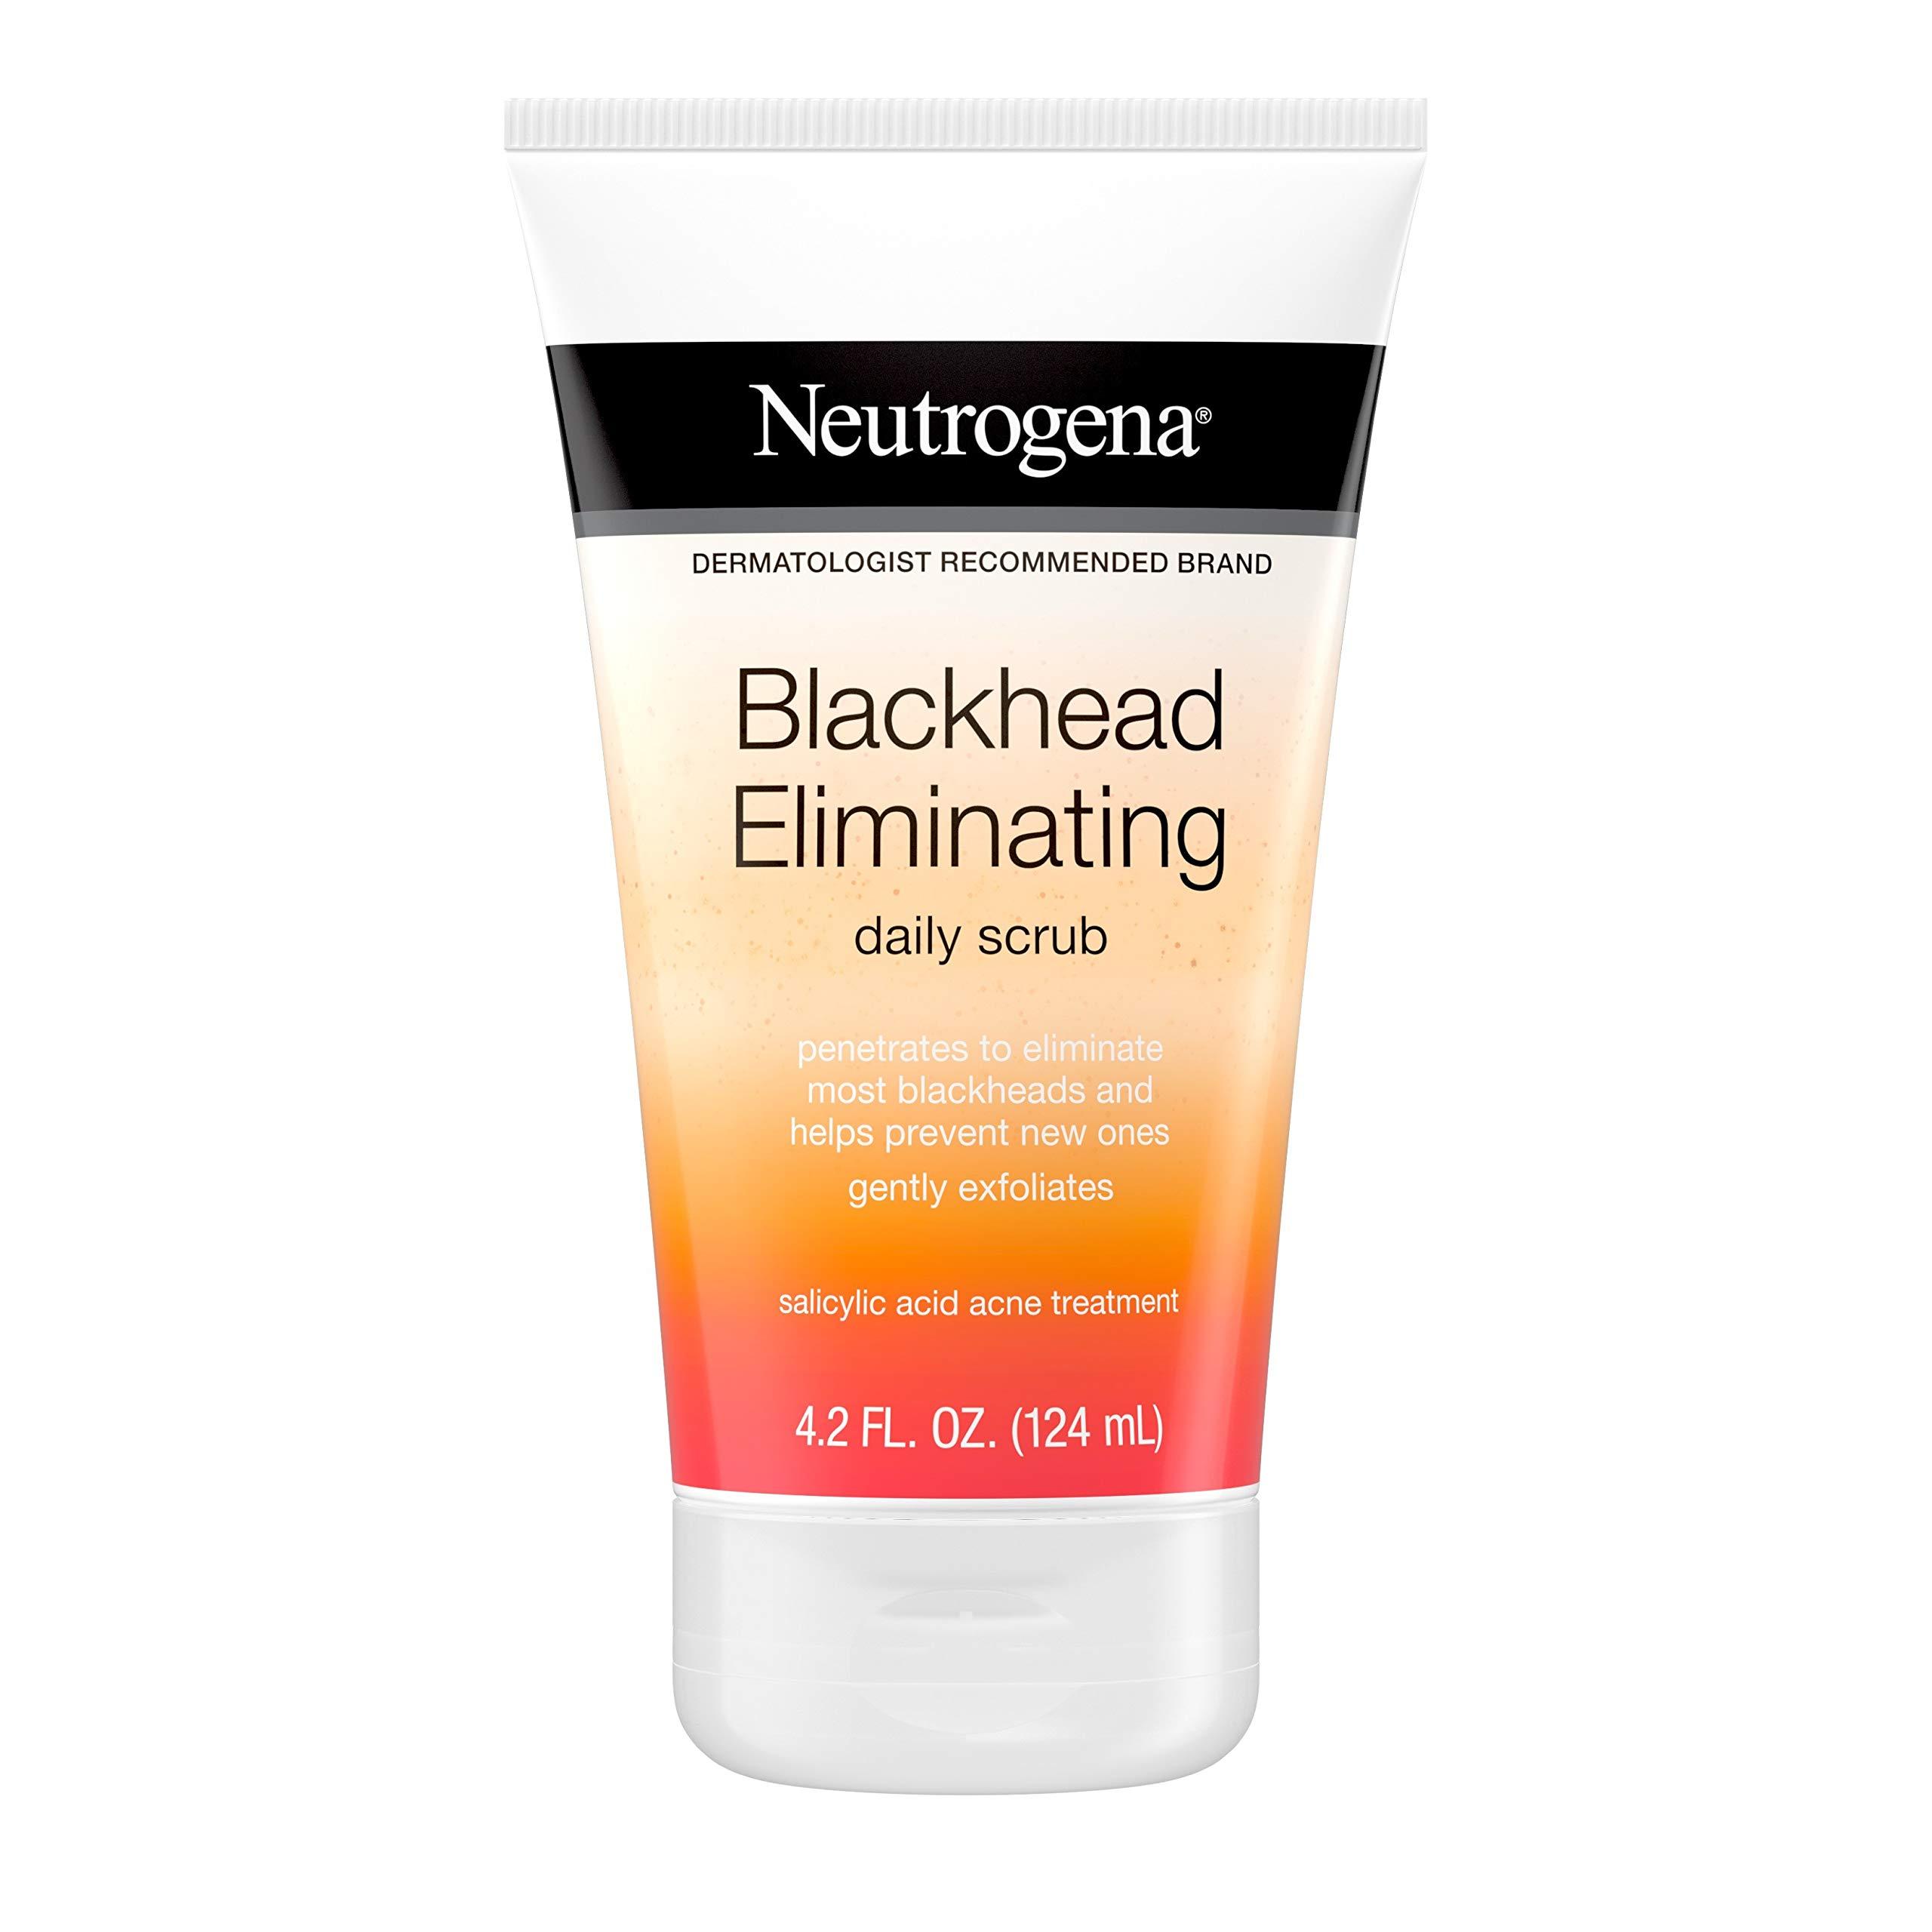 Neutrogena Blackhead Eliminating Daily Facial Scrub With Salicylic Acid Acne Medicine, Exfoliating Face Wash for Blackheads, 4.2 oz (Pack of 6) by Neutrogena